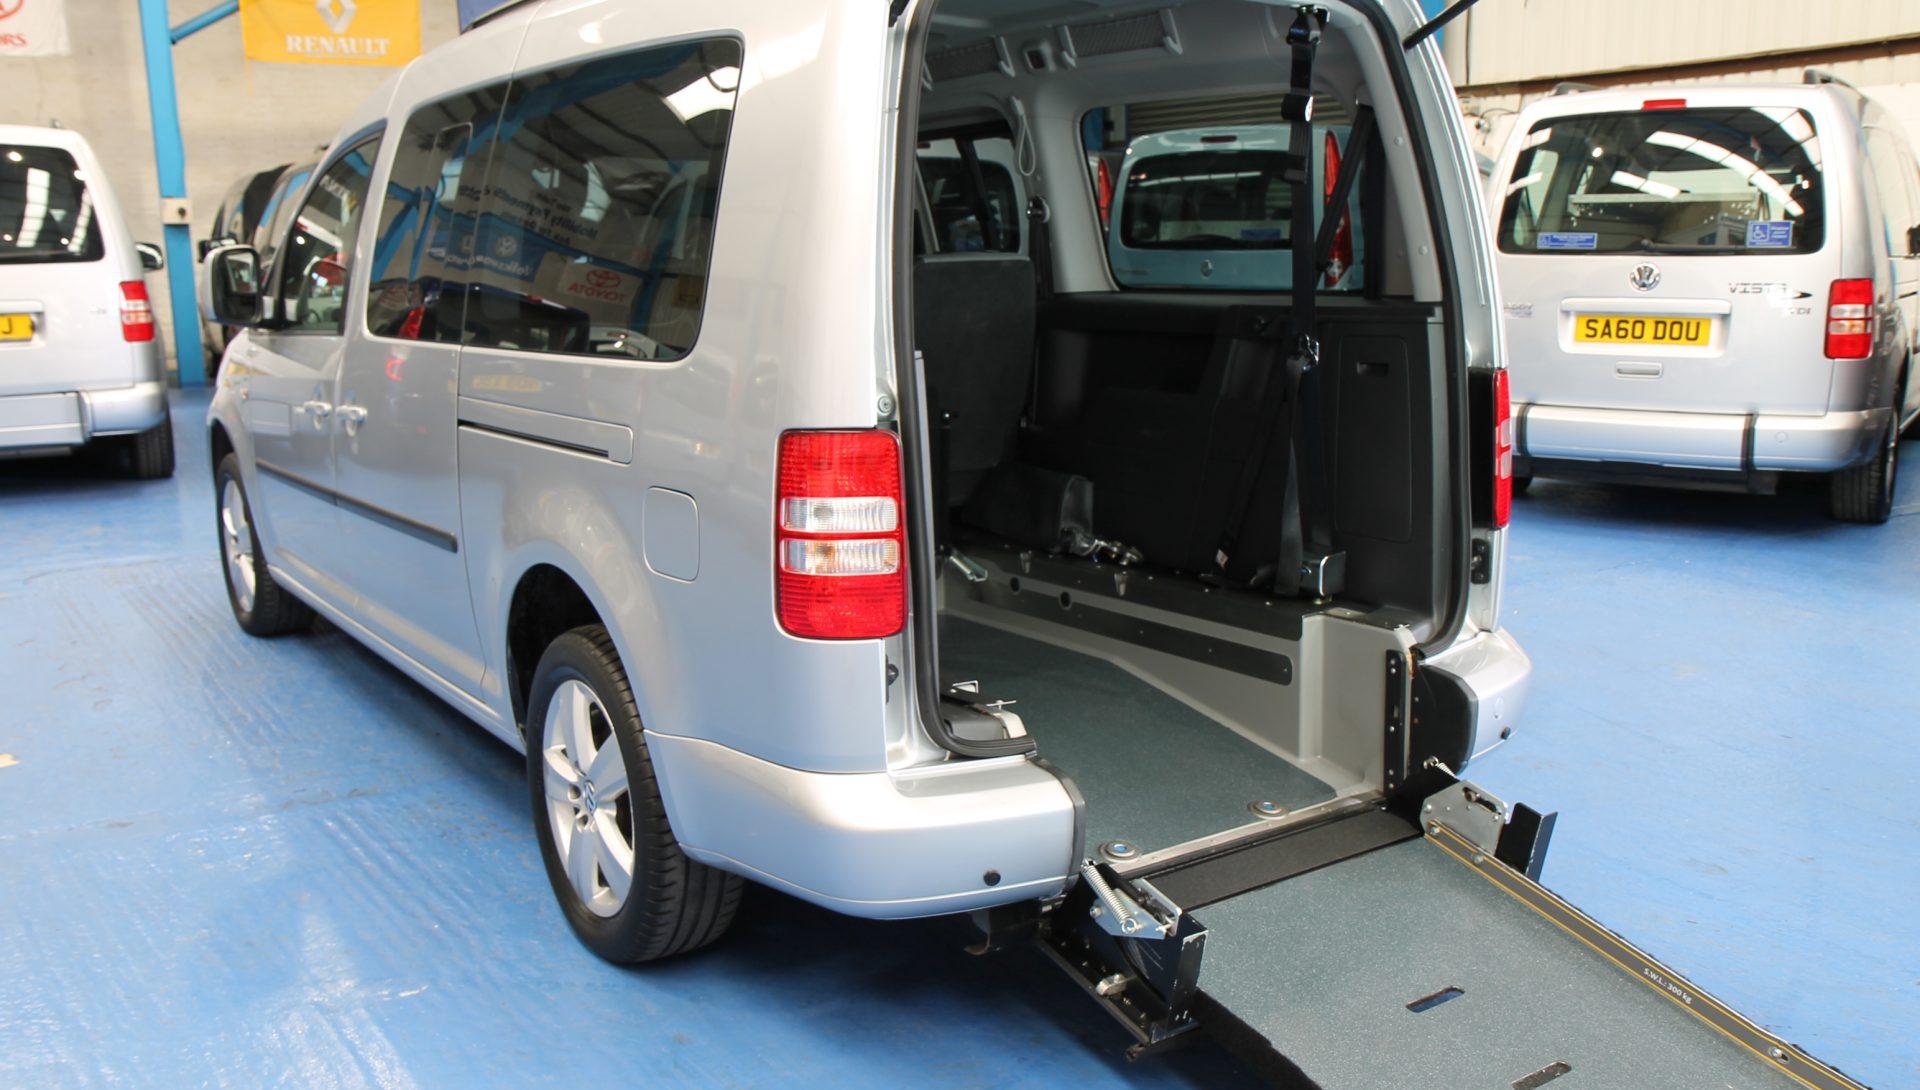 VW Caddy Wheelchair accessible car sj60